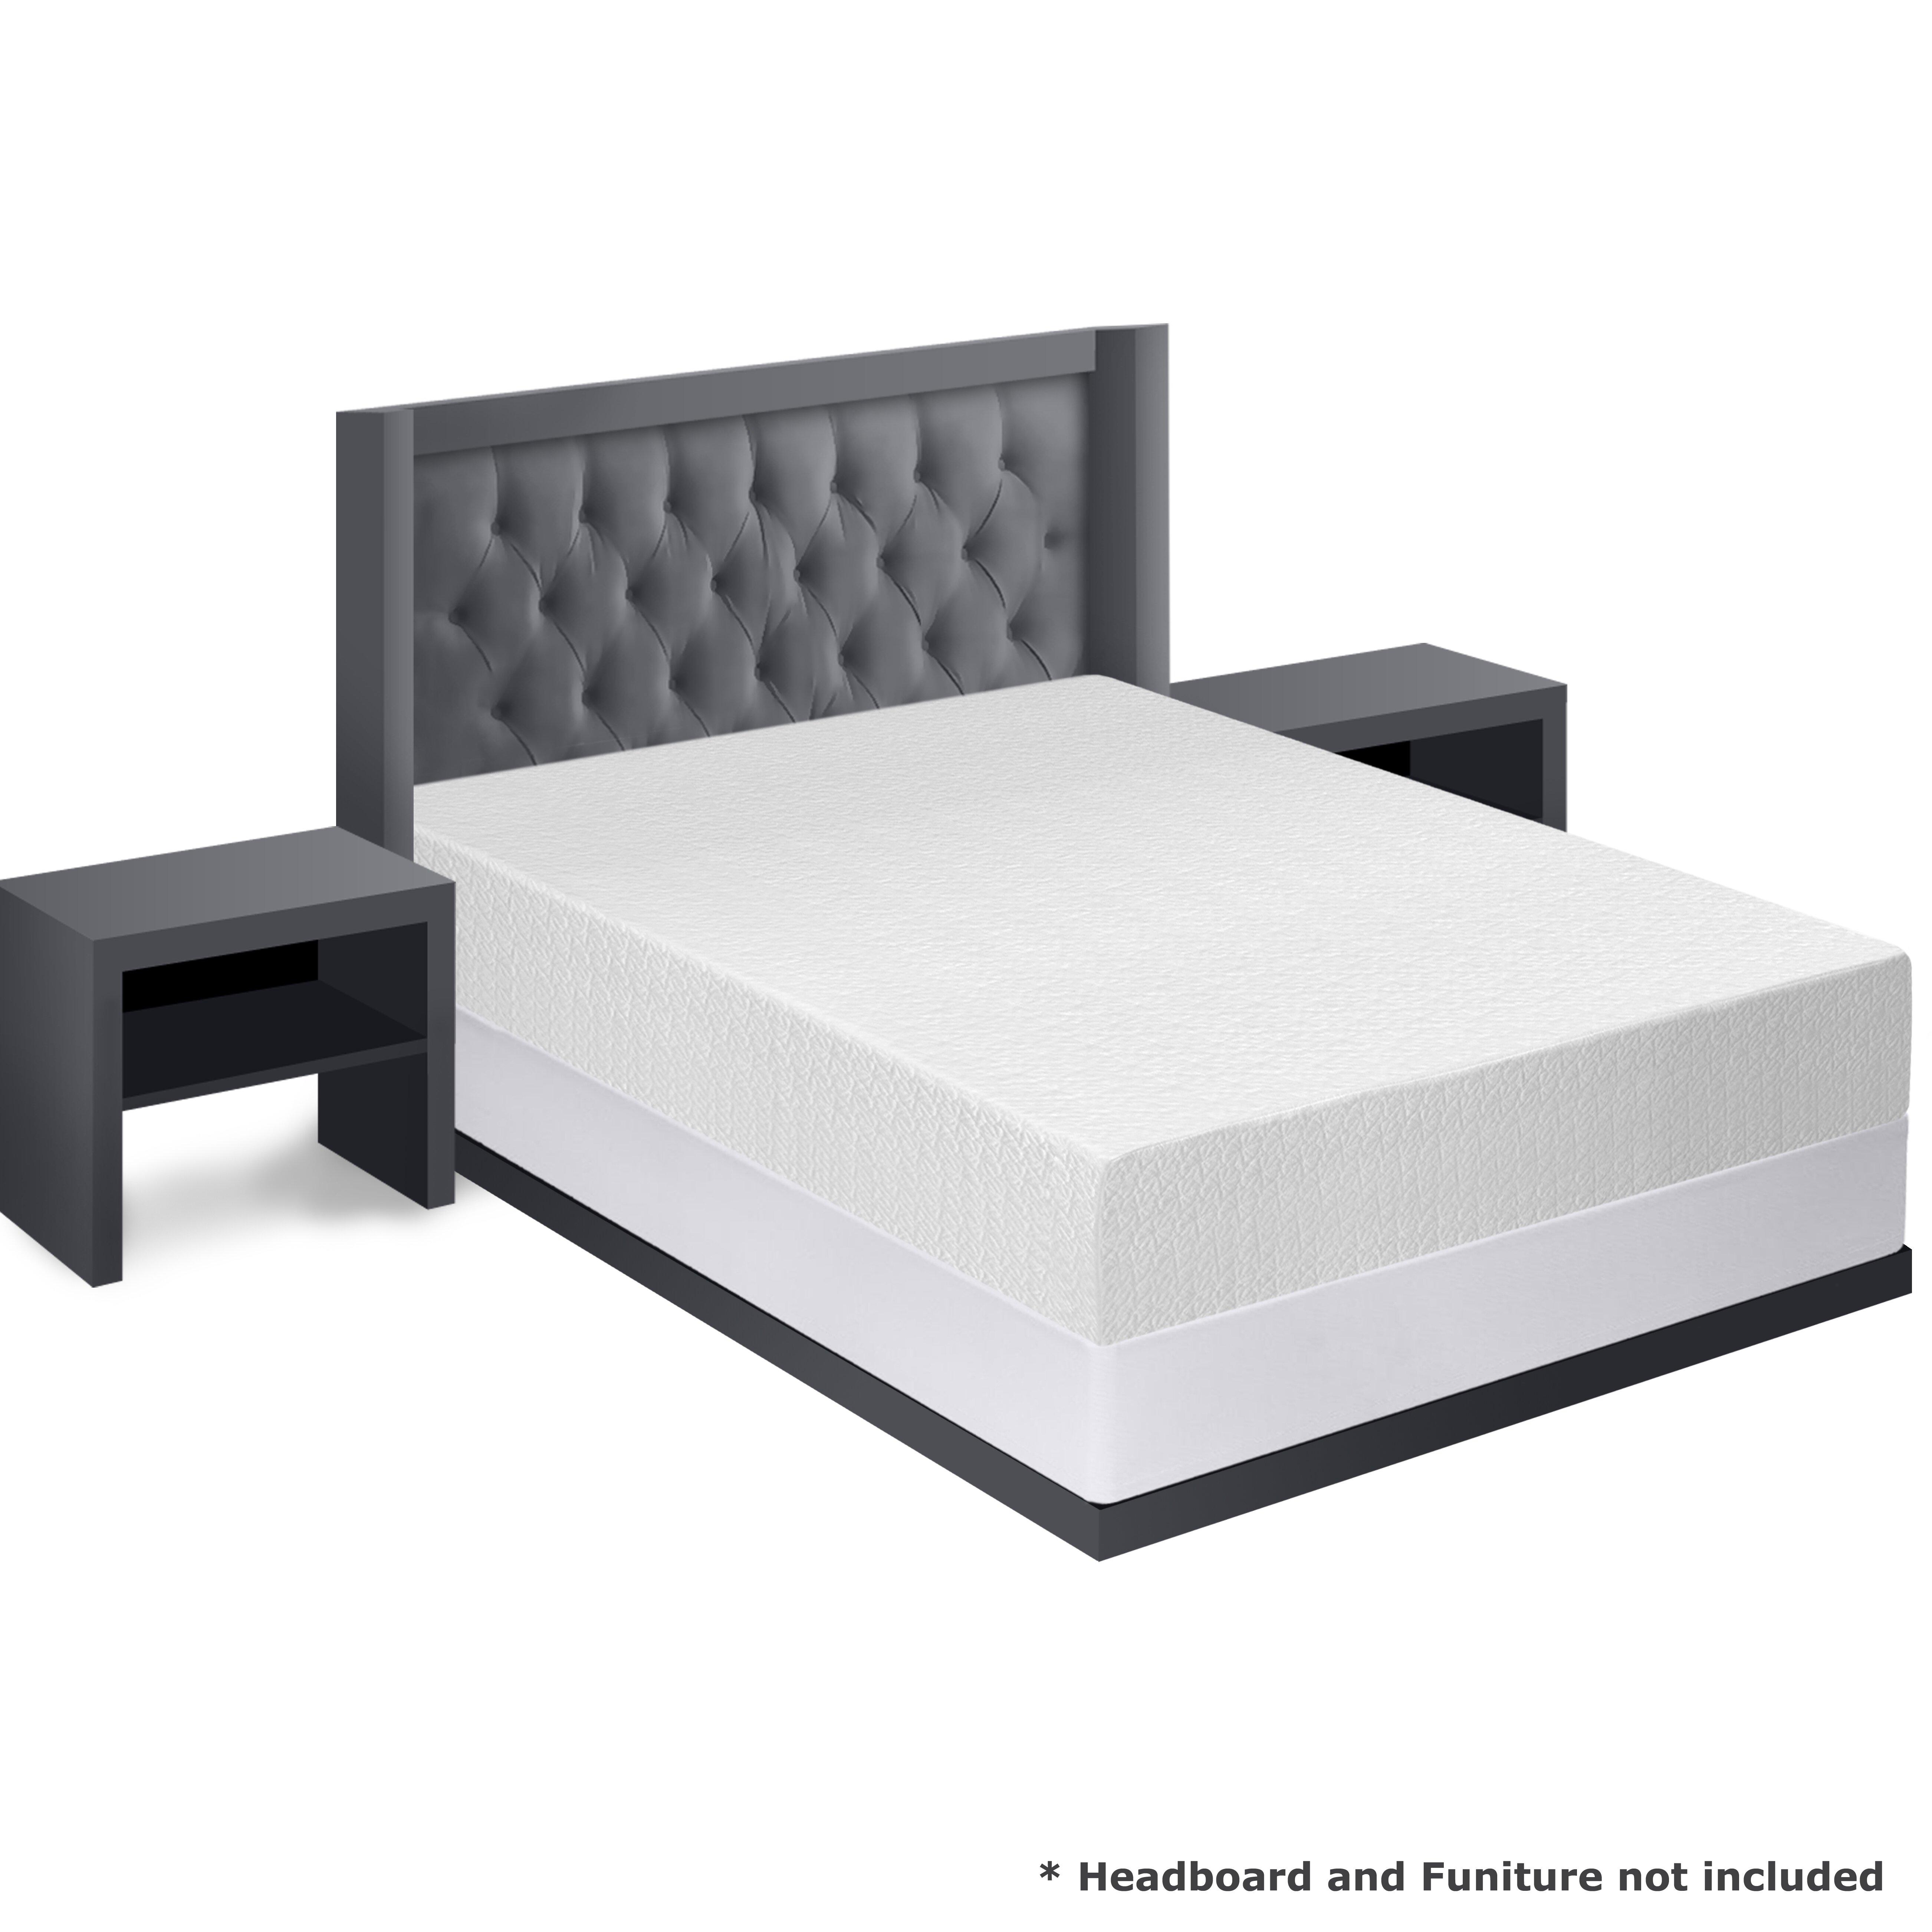 Best Price Quality 10 Memory Foam Mattress And Bi Fold Steel Box Spring Set Wayfair